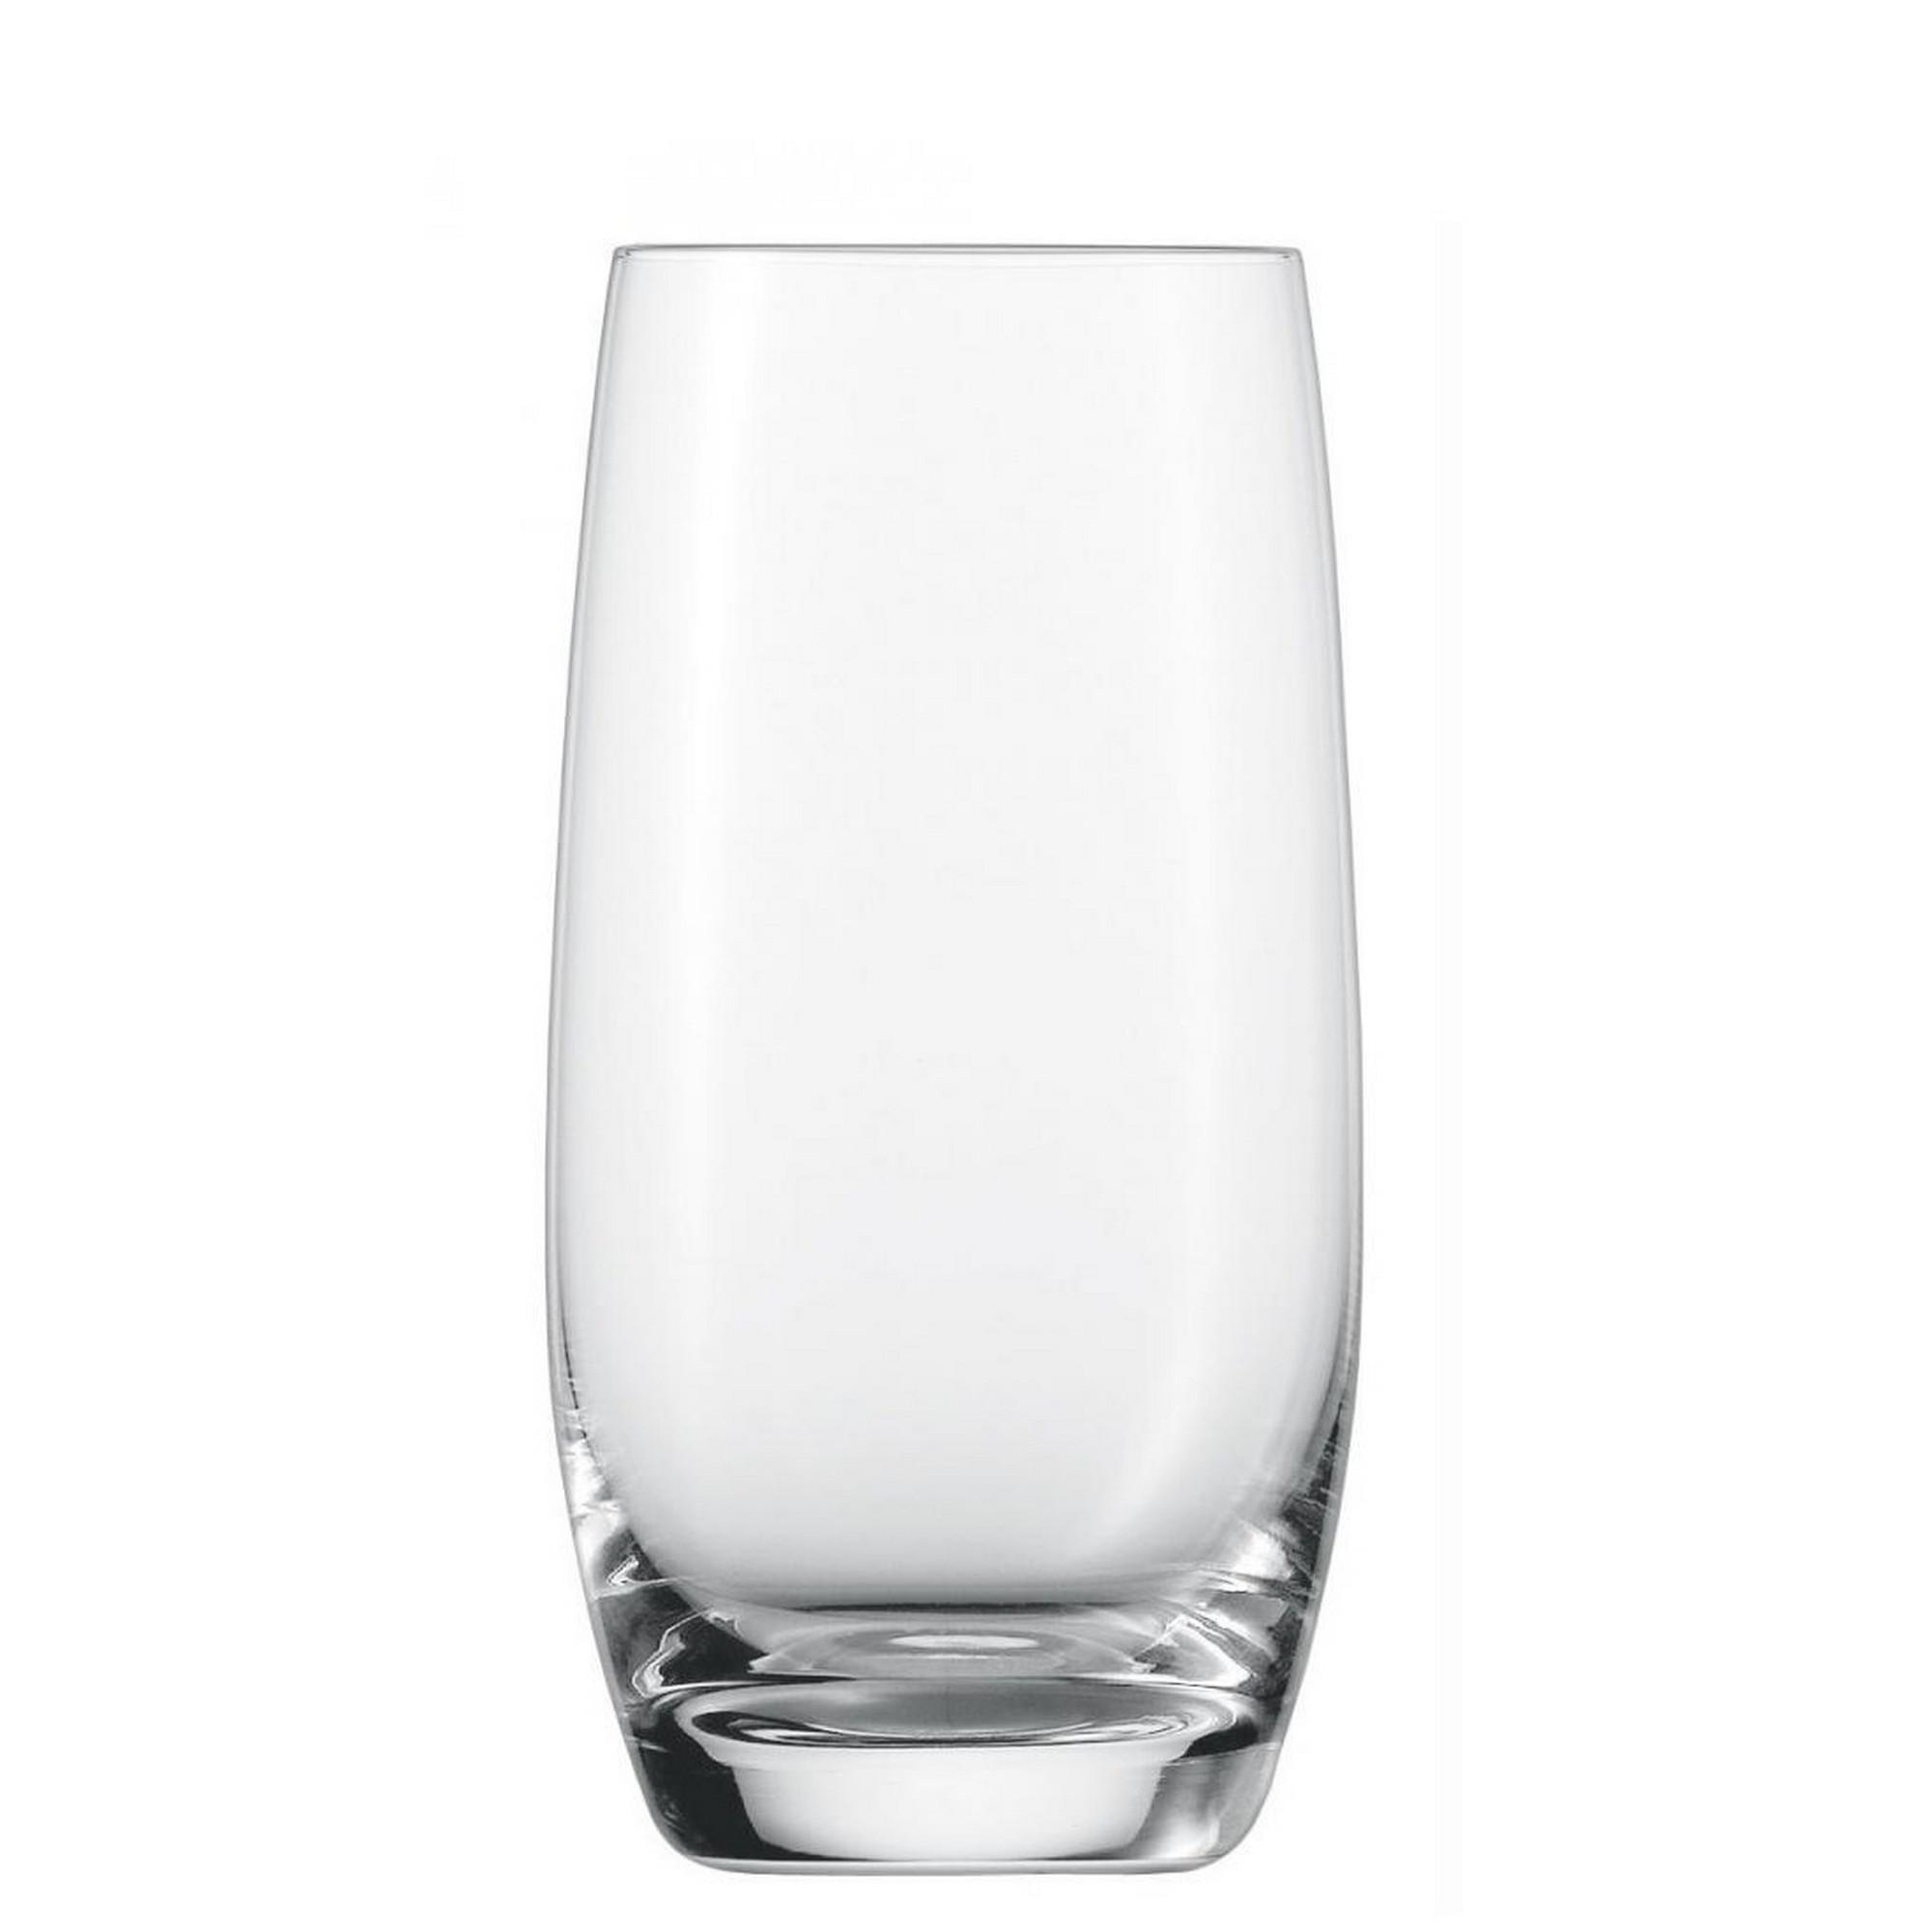 Copo para Cerveja 420ml Schott Zwiesel Banquet 6 Peças de Cristal